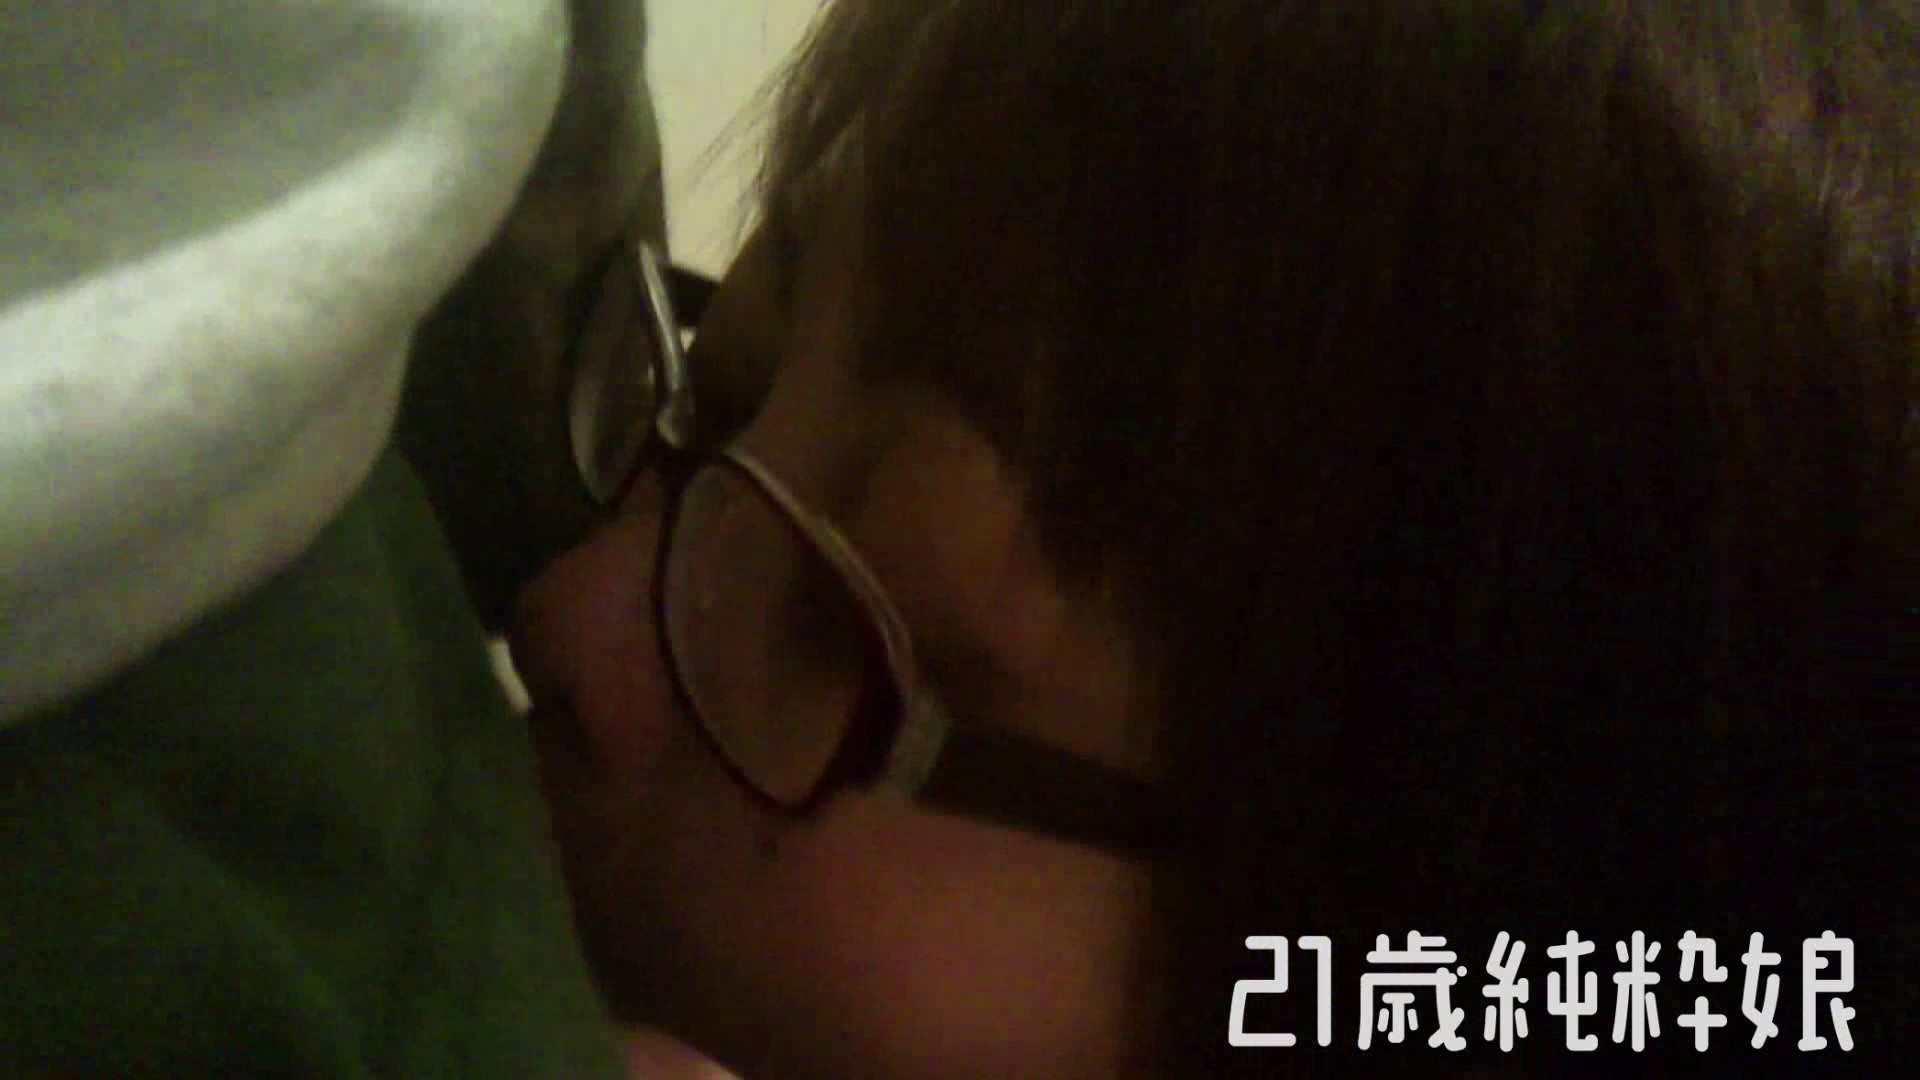 Gカップ21歳純粋嬢第2弾Vol.5 OLのエロ生活 ヌード画像 108連発 47